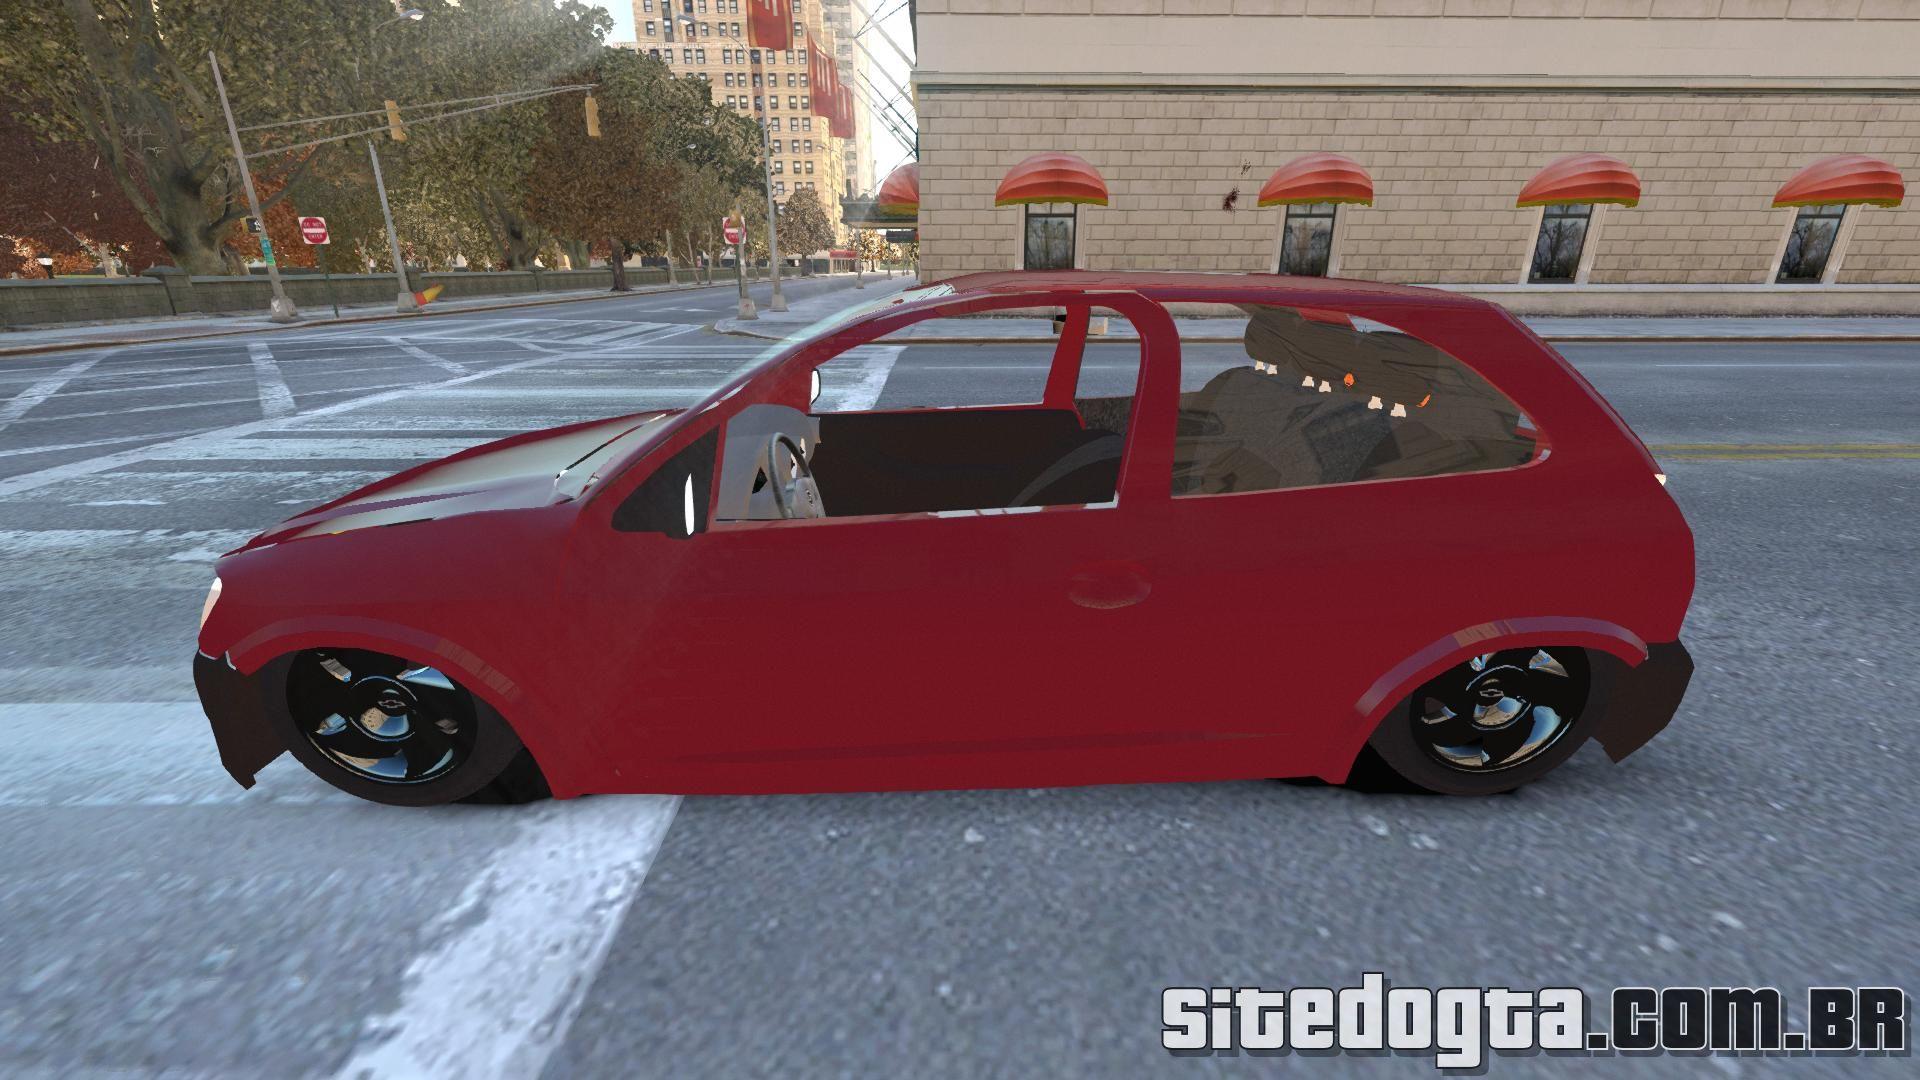 Grand Theft Auto VI - GTA 6 CONFIRMED! GTA 6 Release Date, Leaks ...